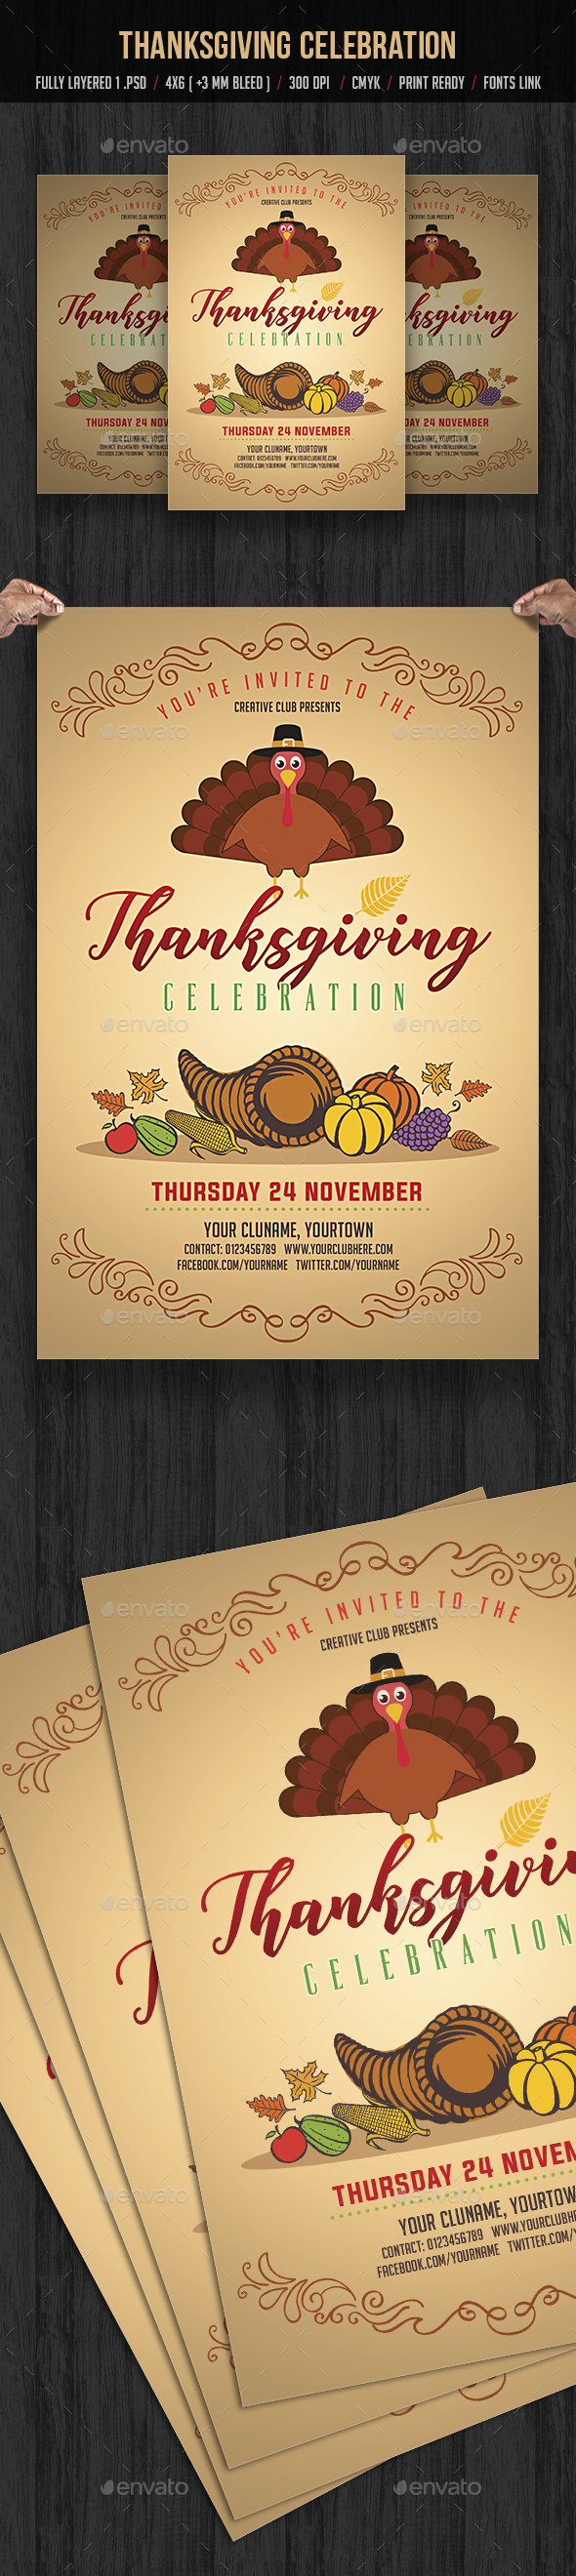 GraphicRiver Thanksgiving Celebration 20813513